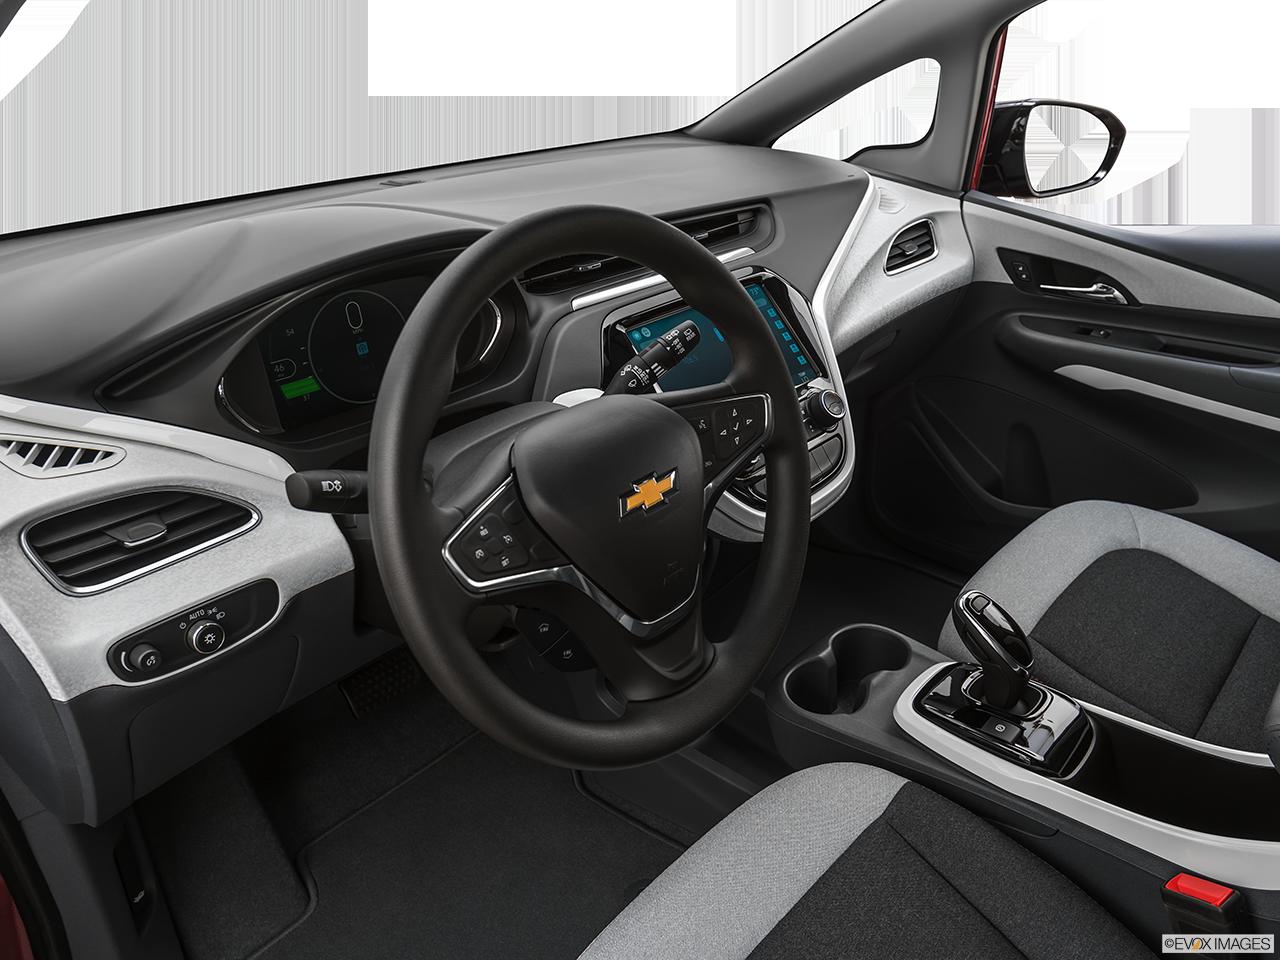 2019 Chevrolet Bolt EV photo